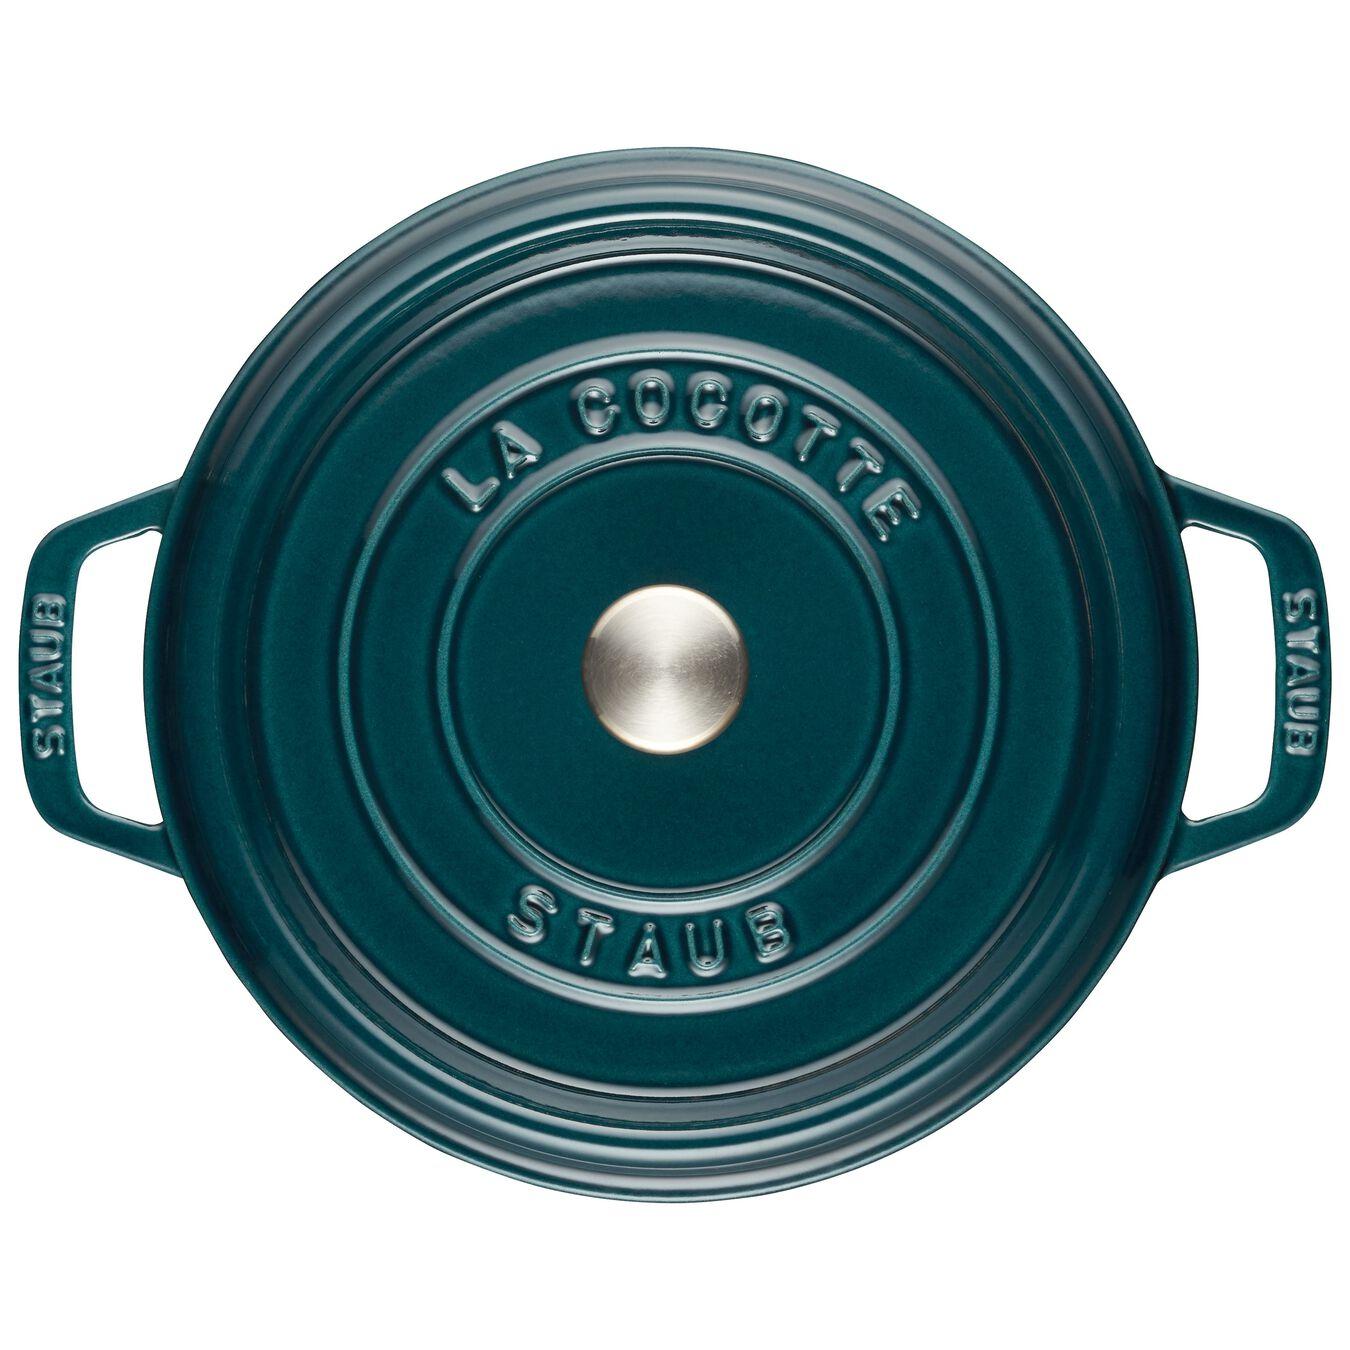 Cocotte 24 cm, rund, La-Mer, Gusseisen,,large 4